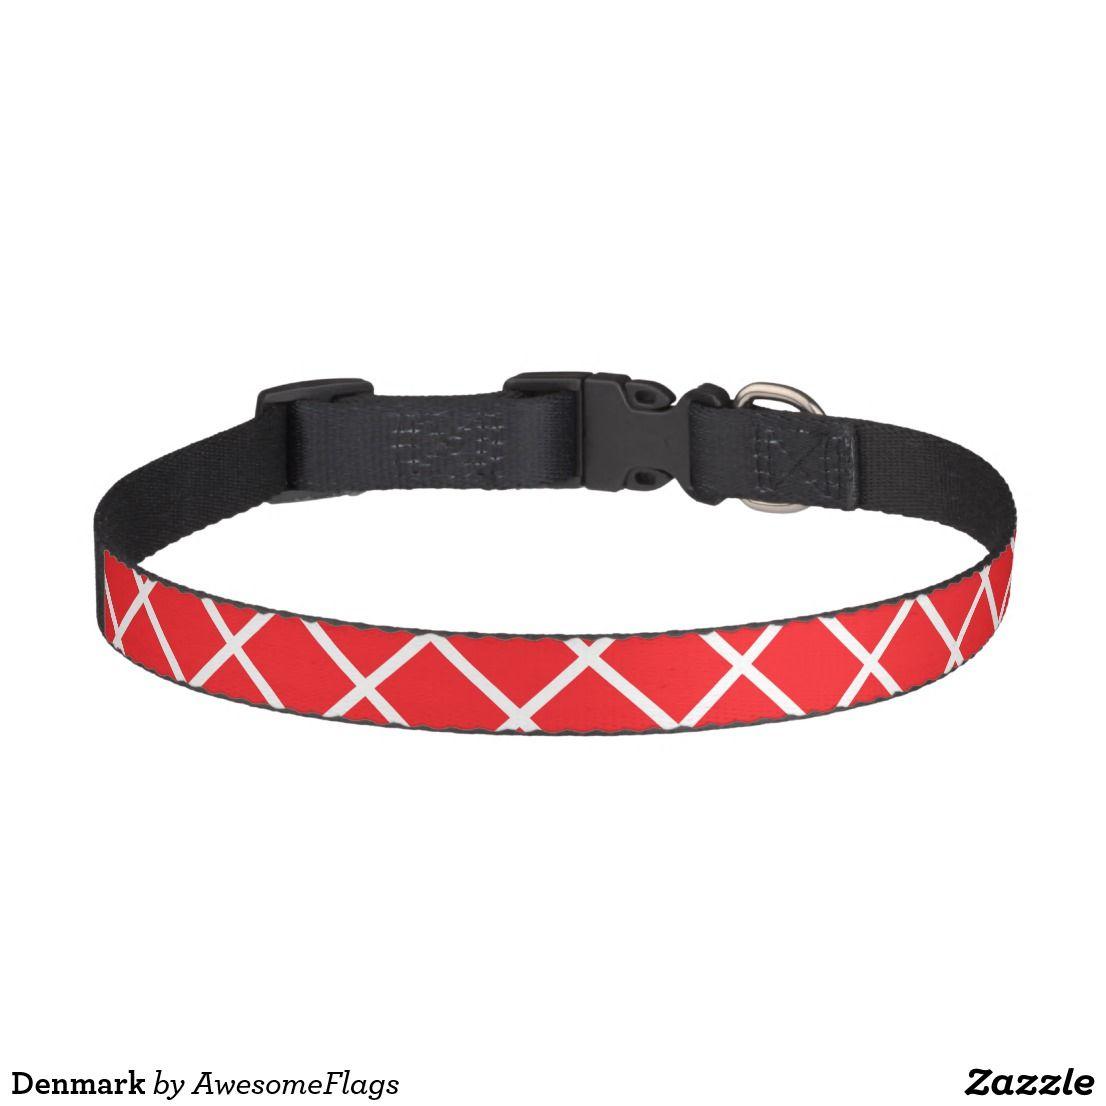 Denmark Pet Collar Zazzle.co.uk Pet collars, Pets